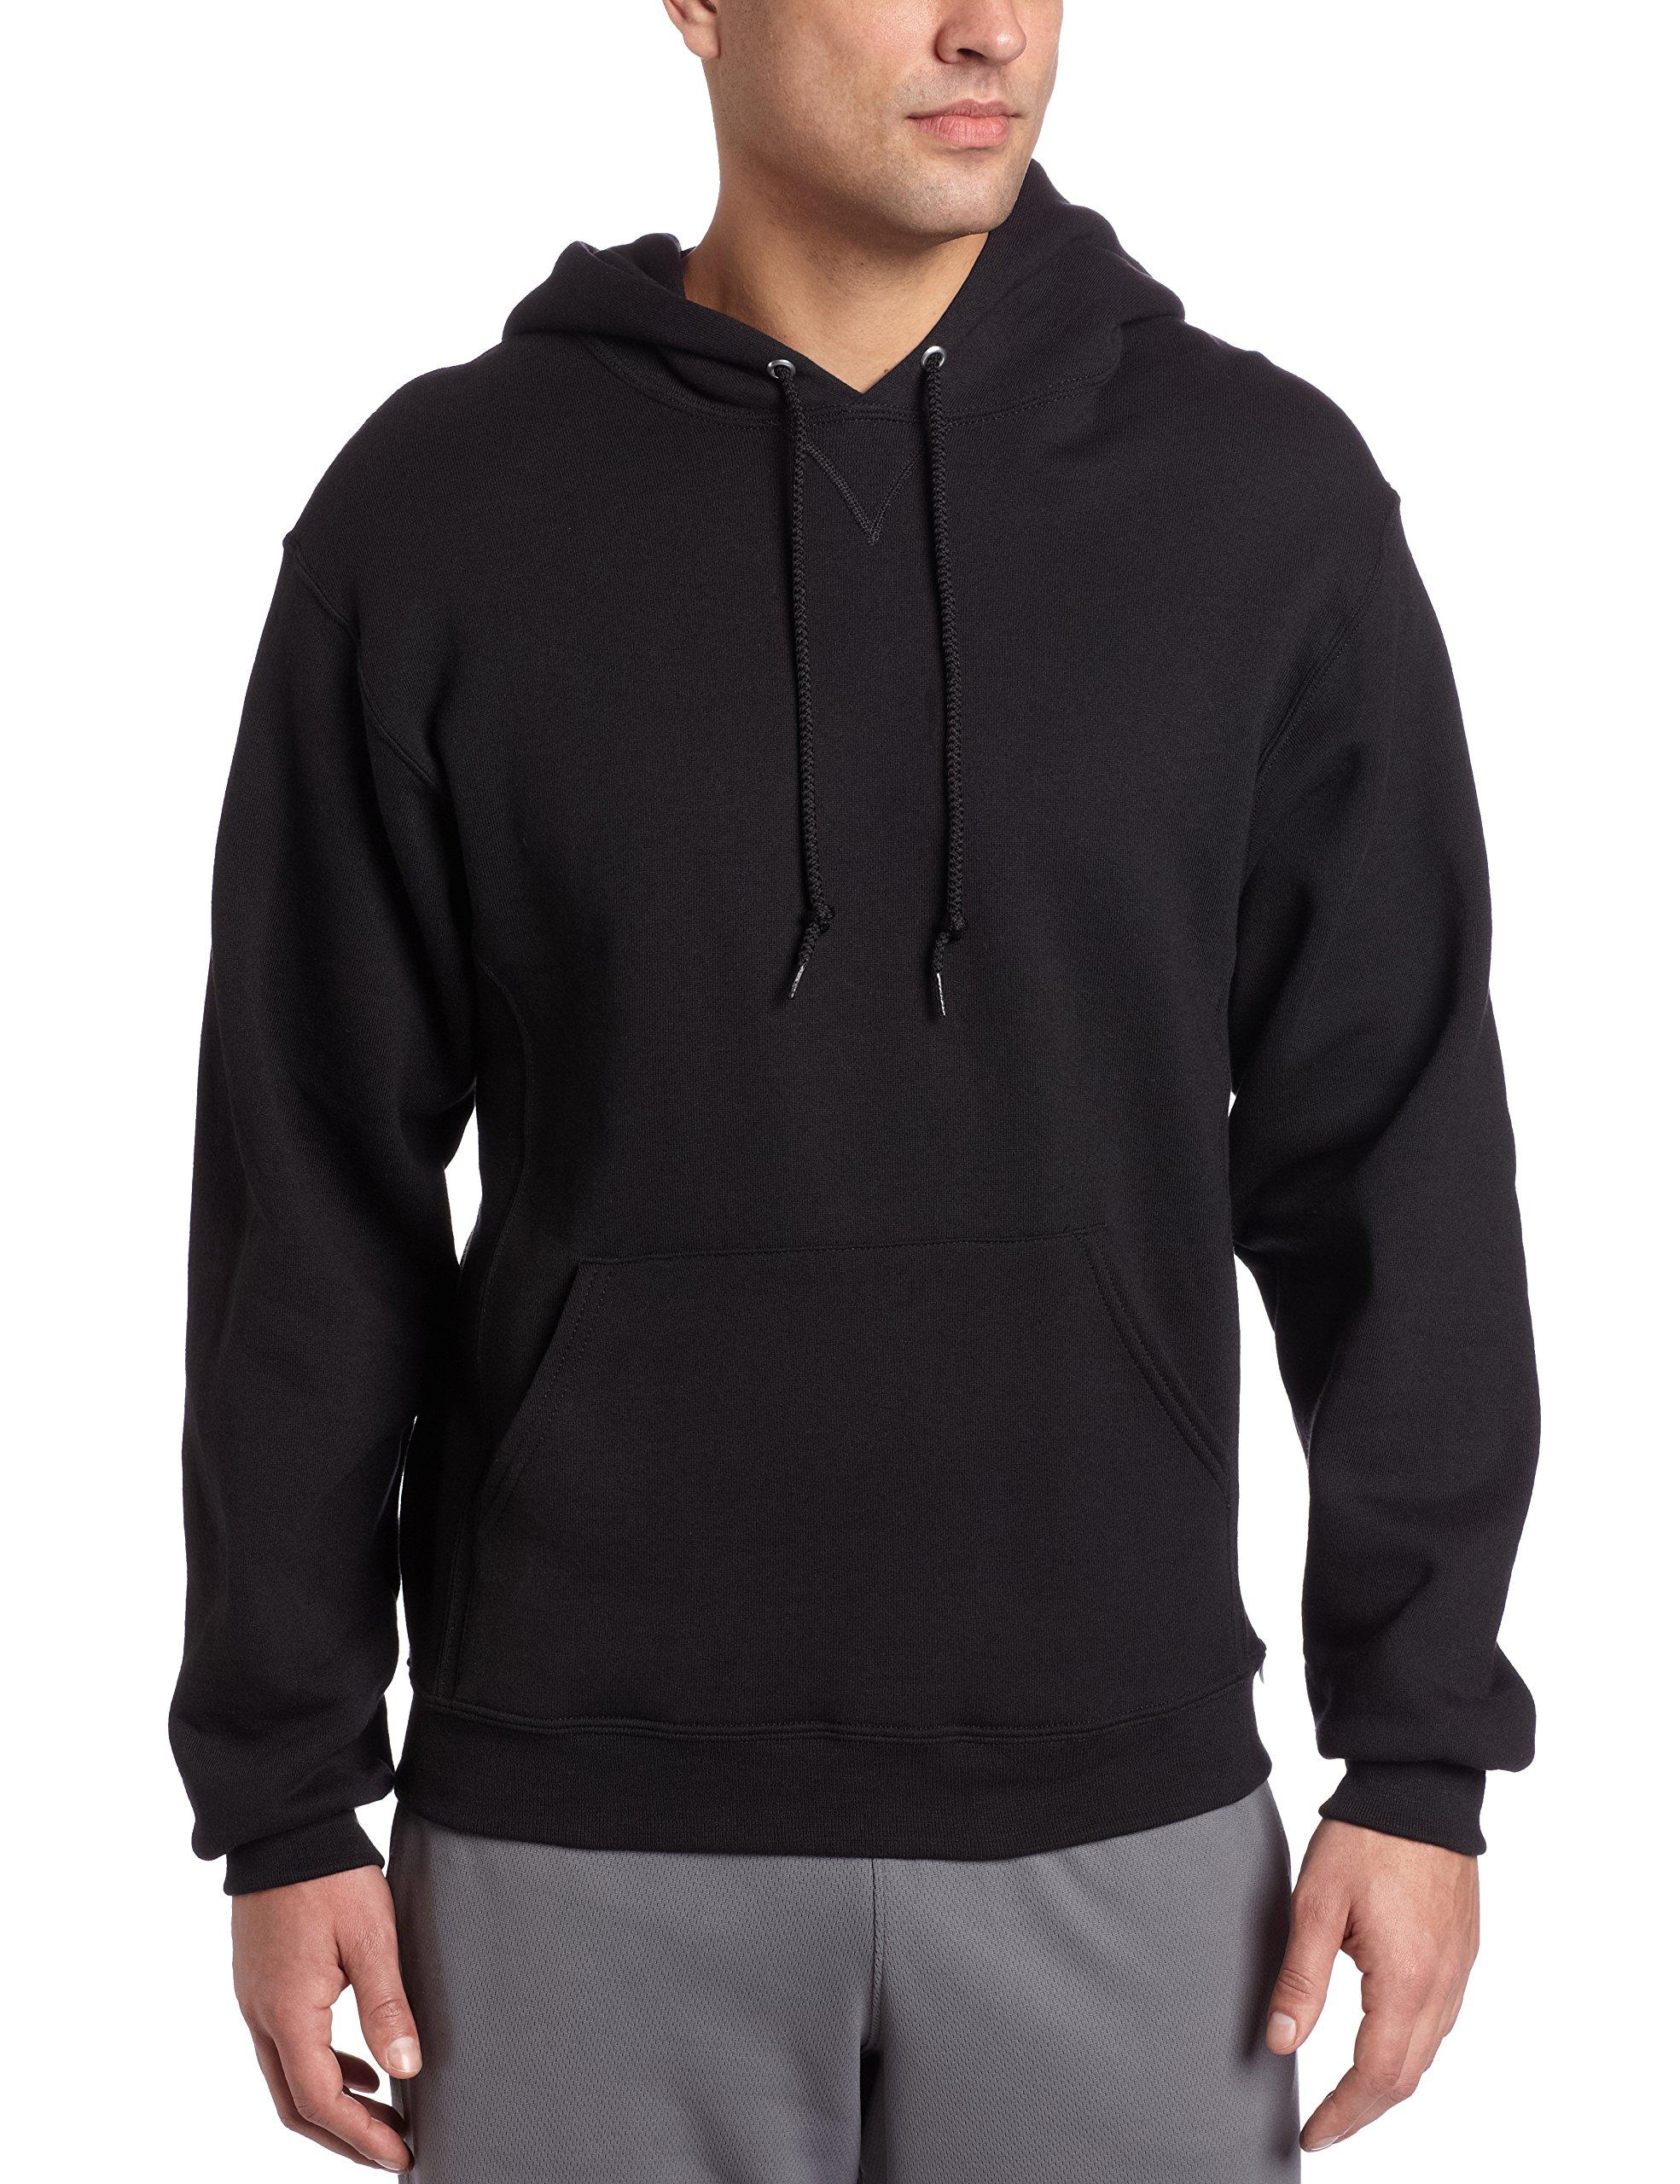 Russell Athletic Men's Dri-Power Pullover Fleece Hoodie, Black, Large